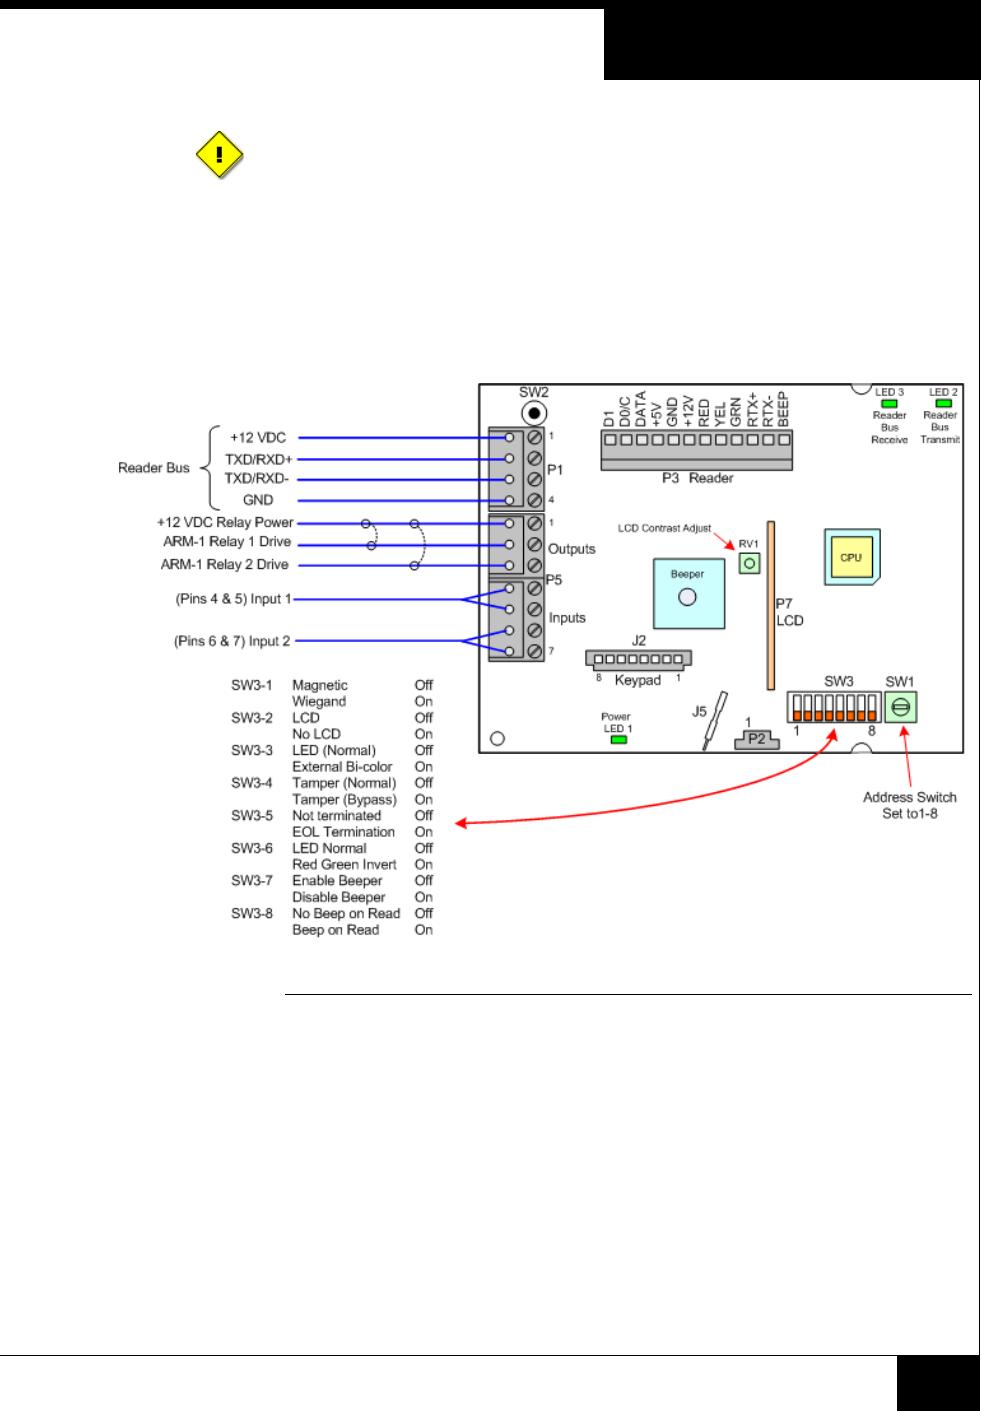 beautiful card reader wiring schematic pattern electrical circuit rh suaiphone org istar pro wiring diagram Lighting Control Panel Wiring Diagram